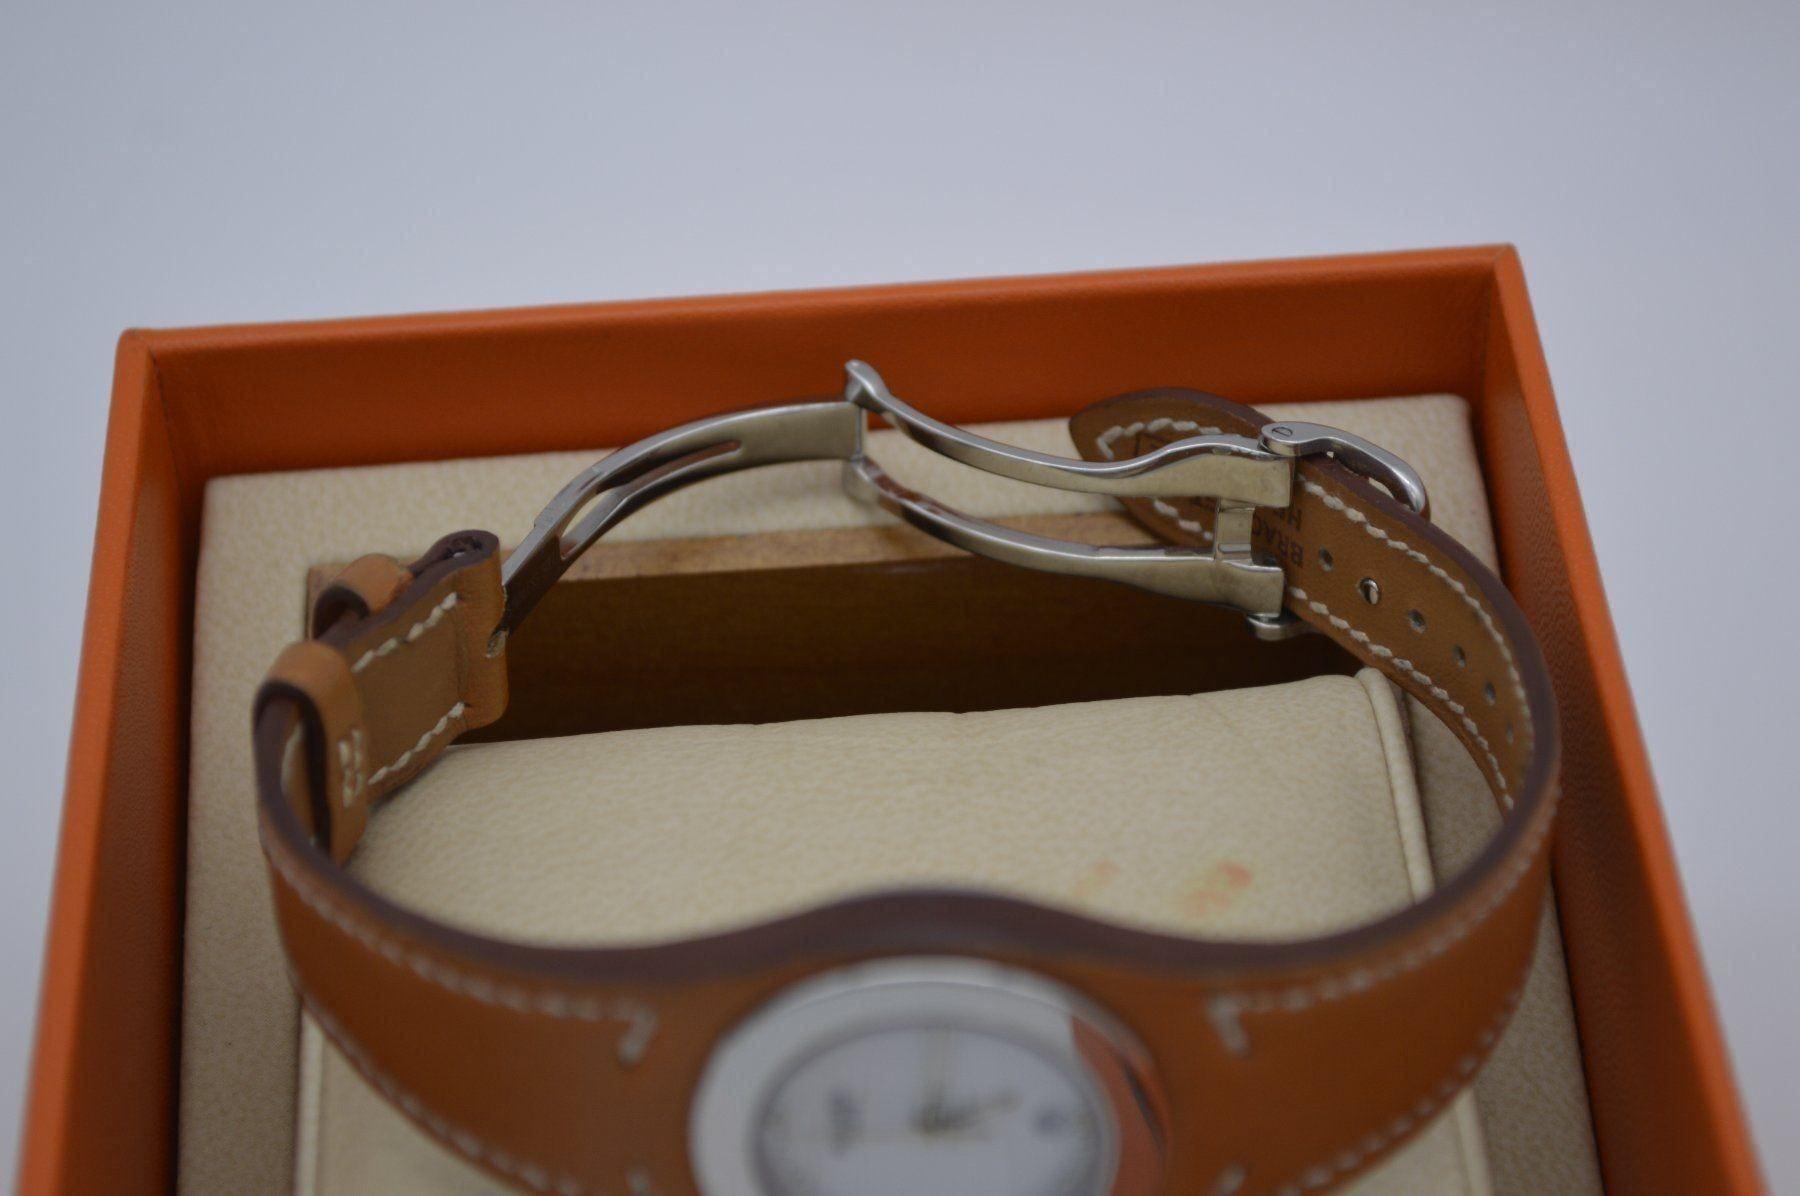 Herms / Harnais HA3.210 - Lady's Steel Wrist Watch - Image 3 of 6